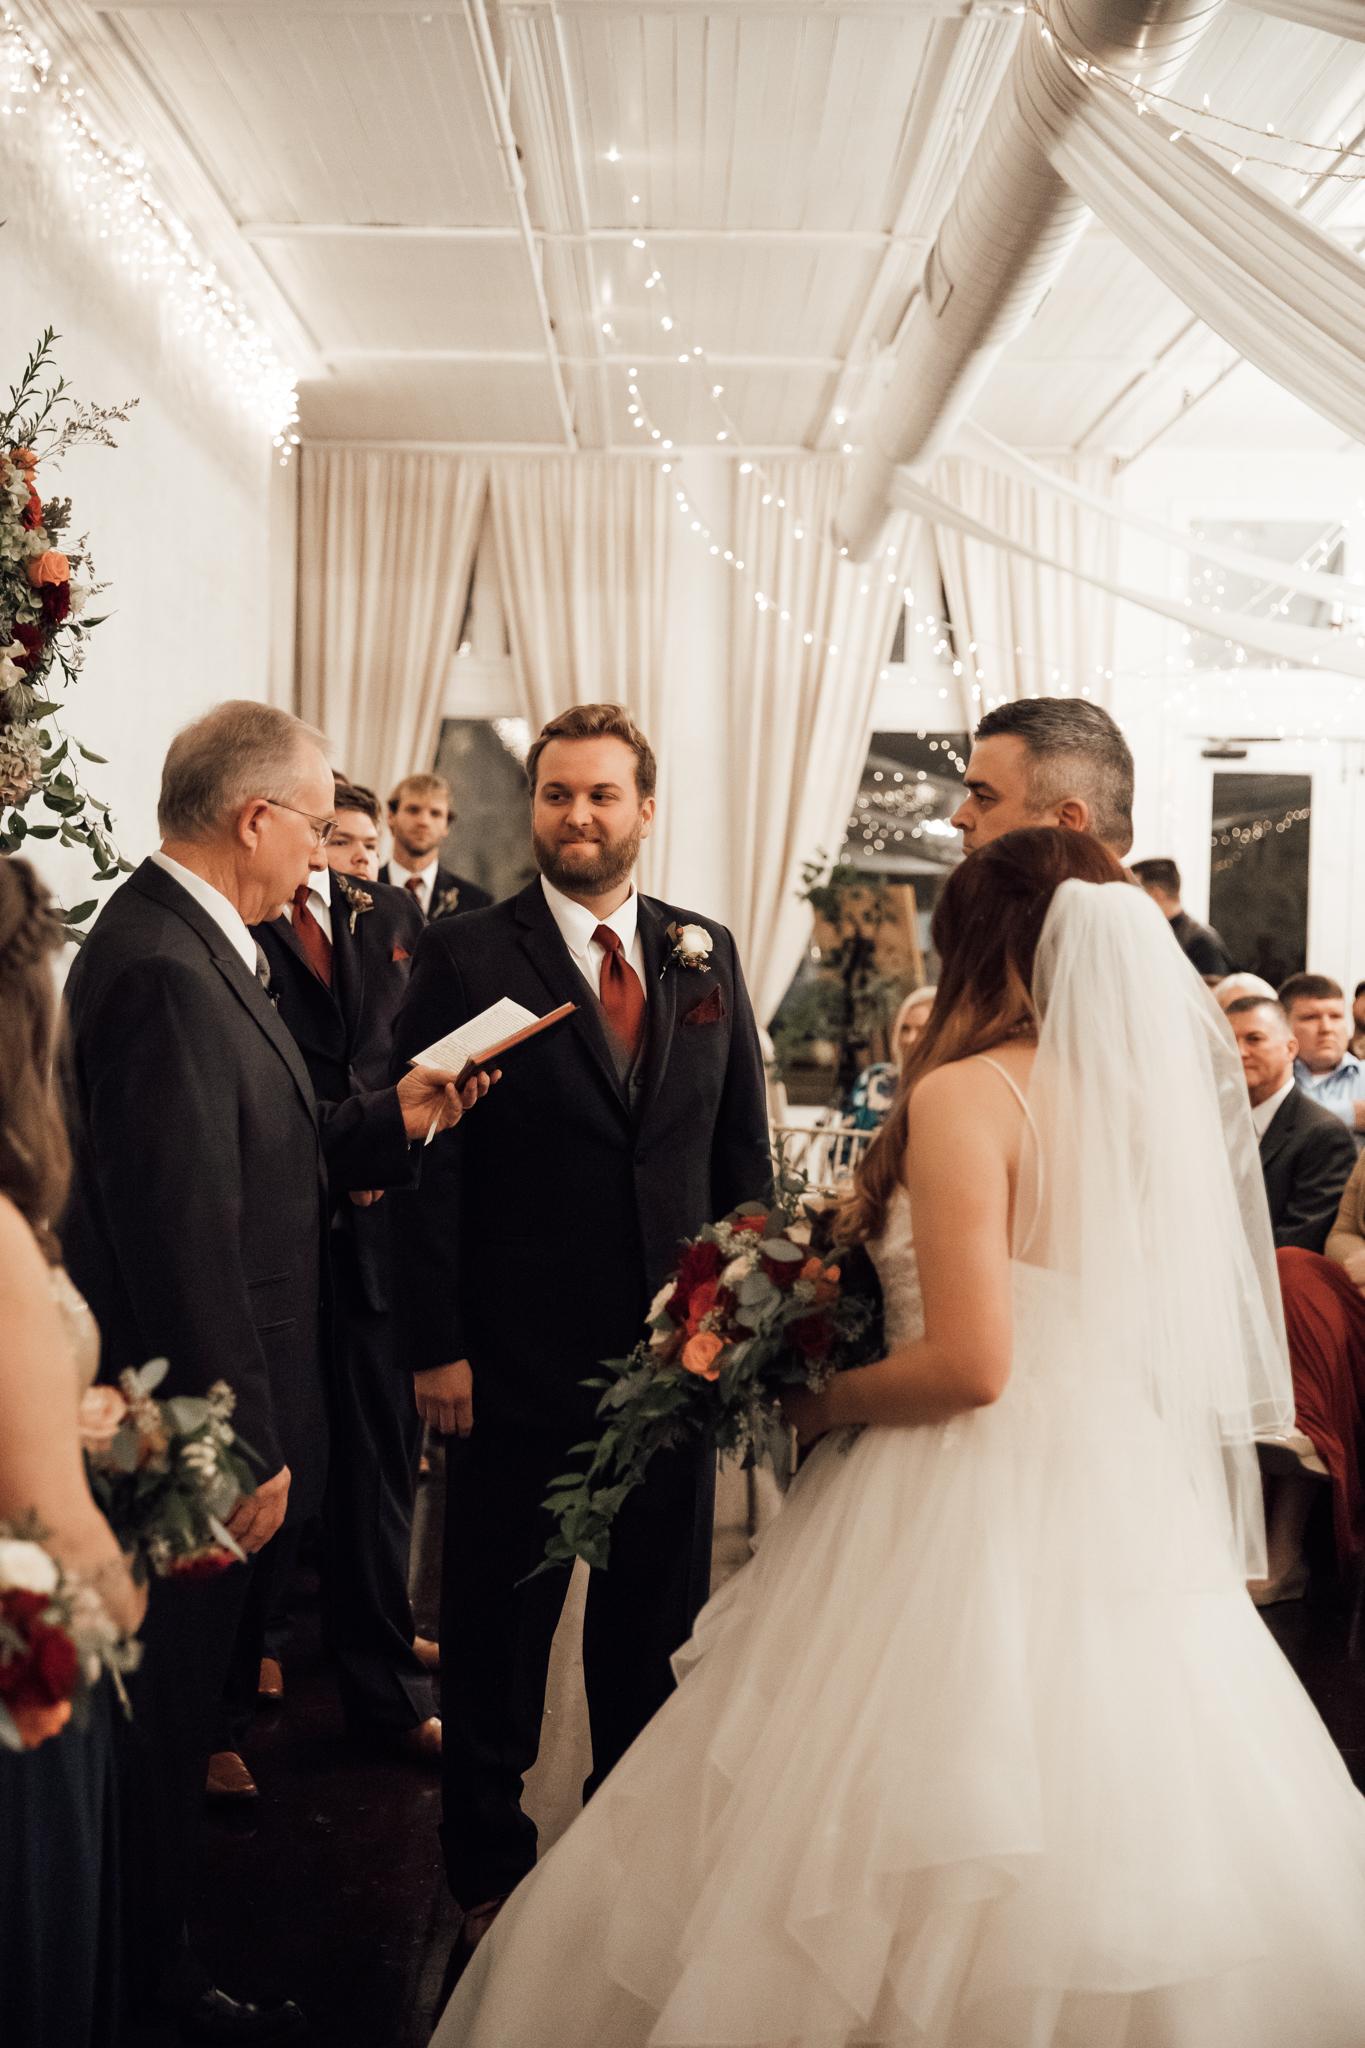 memphis-wedding-photographers-thewarmtharoundyou-ballinese-ballroom (145 of 232).jpg